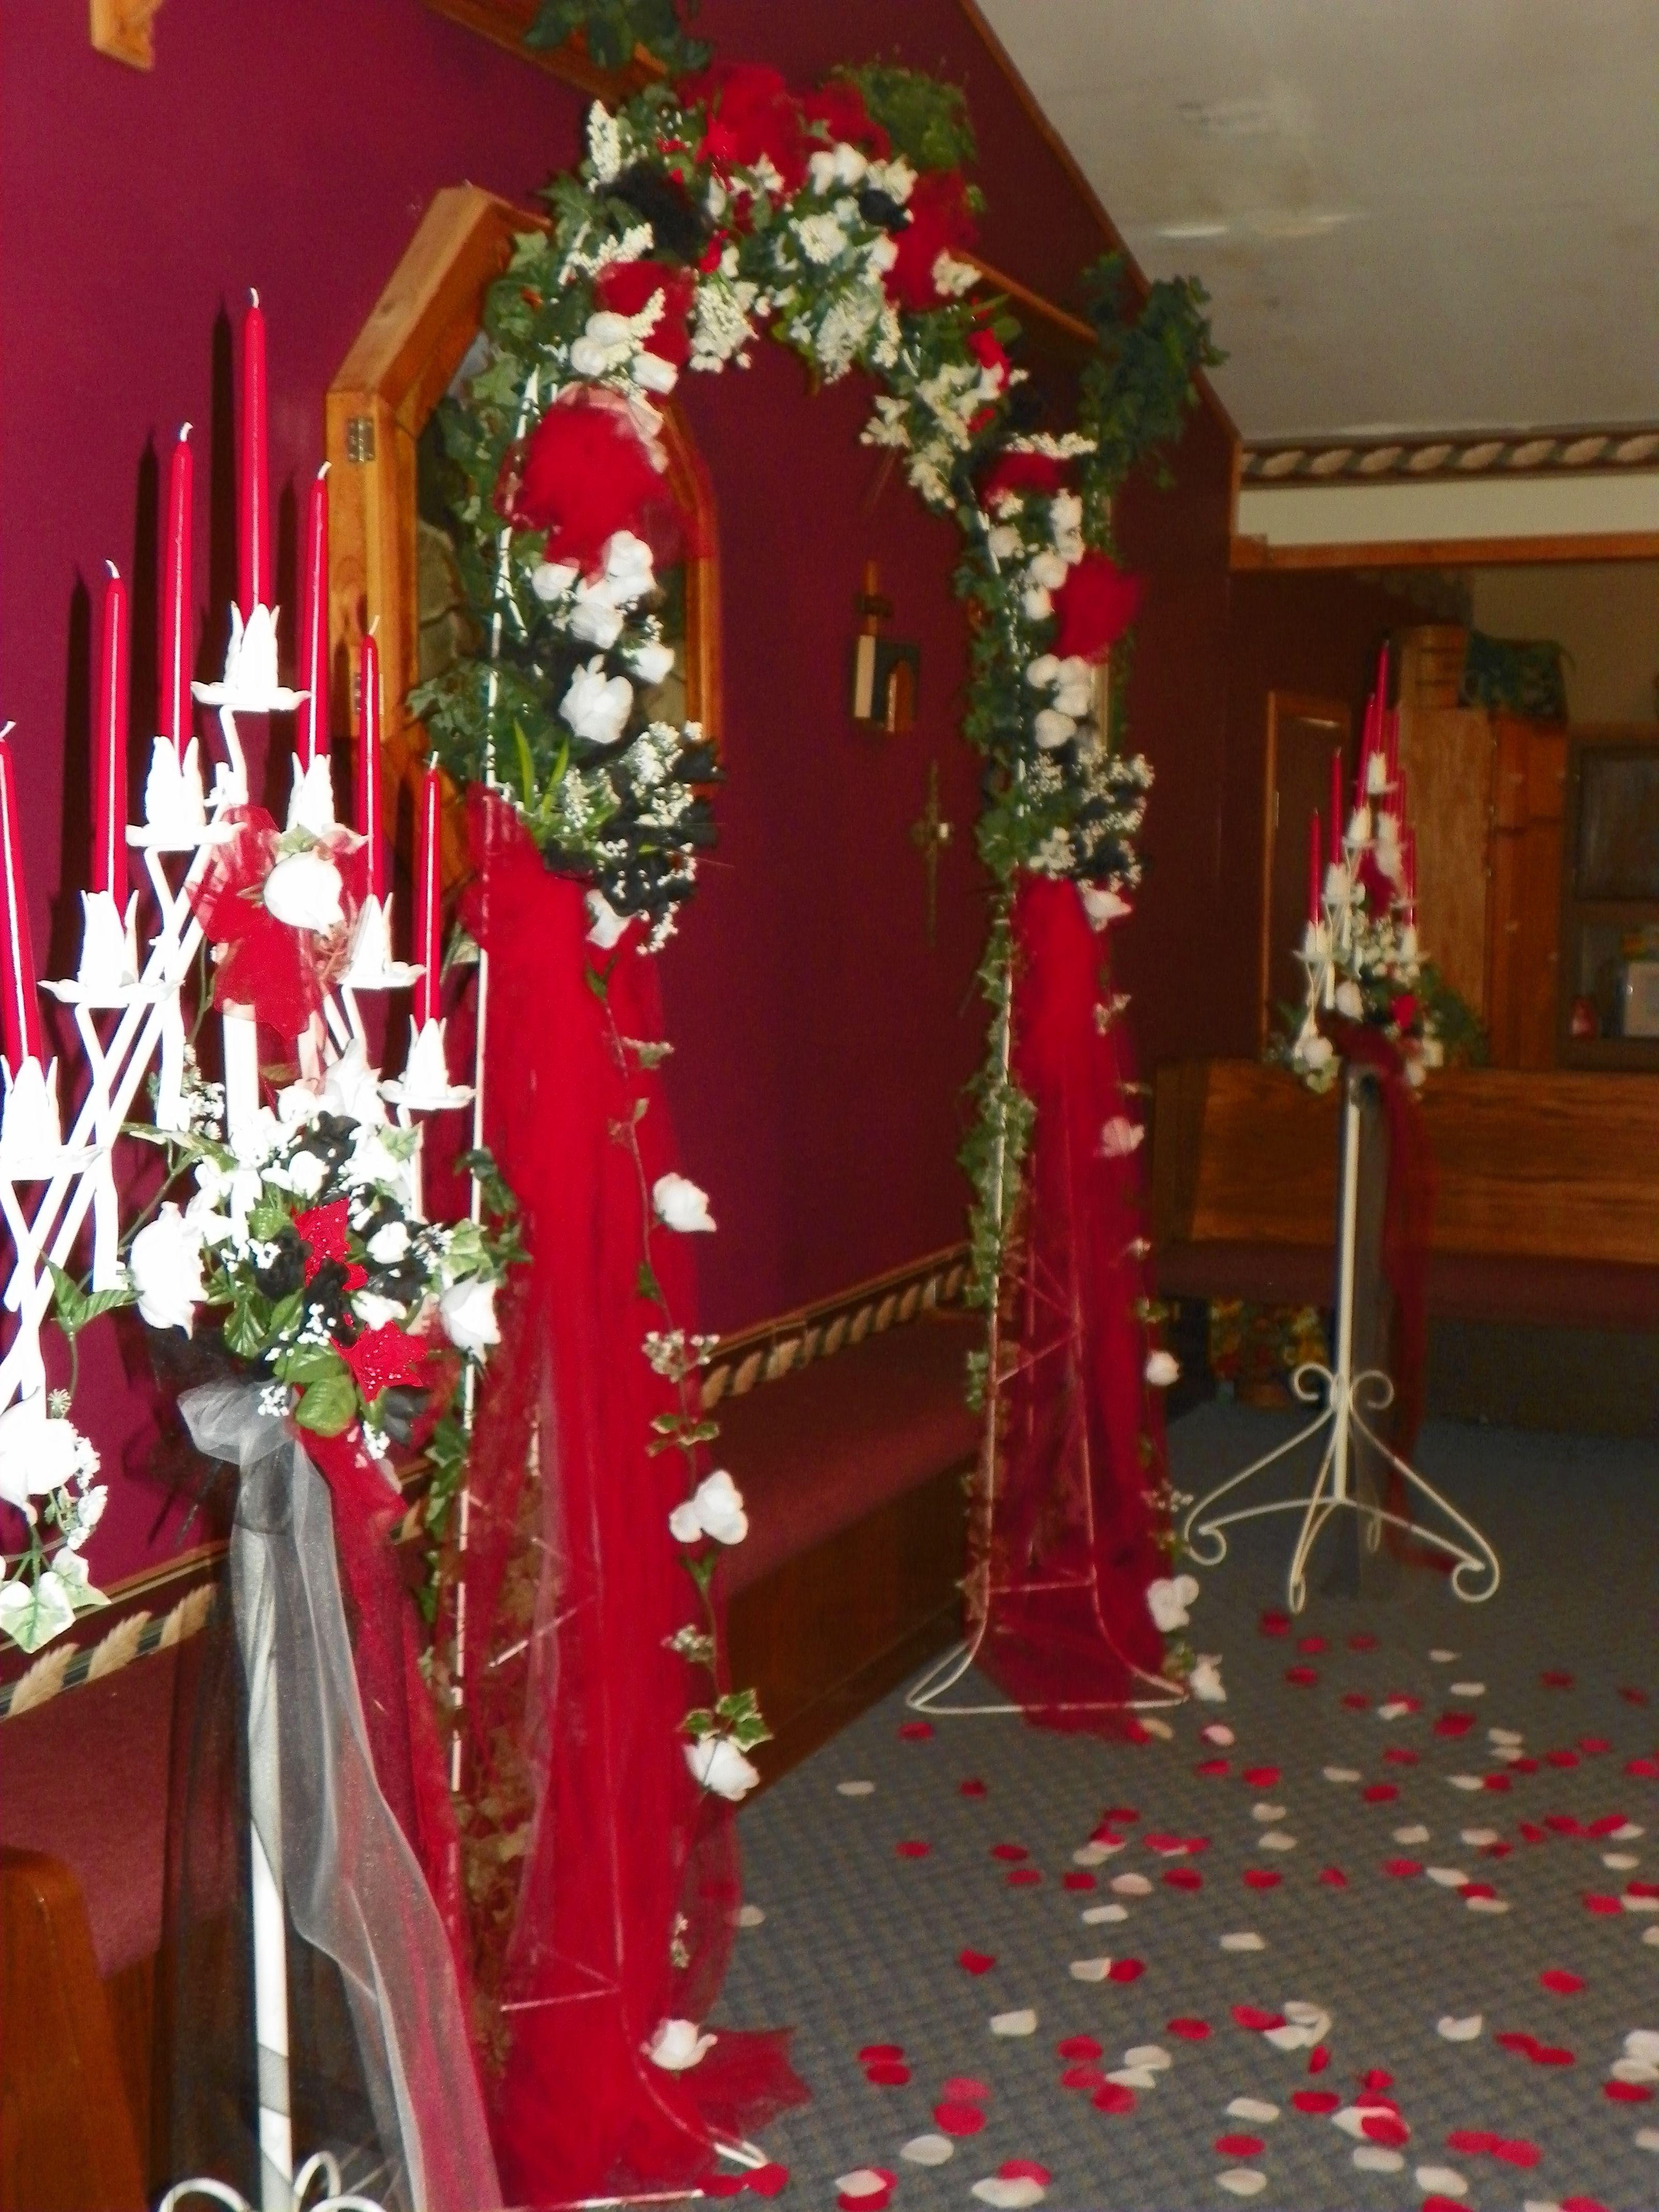 Red, White & Black Wedding Decorations